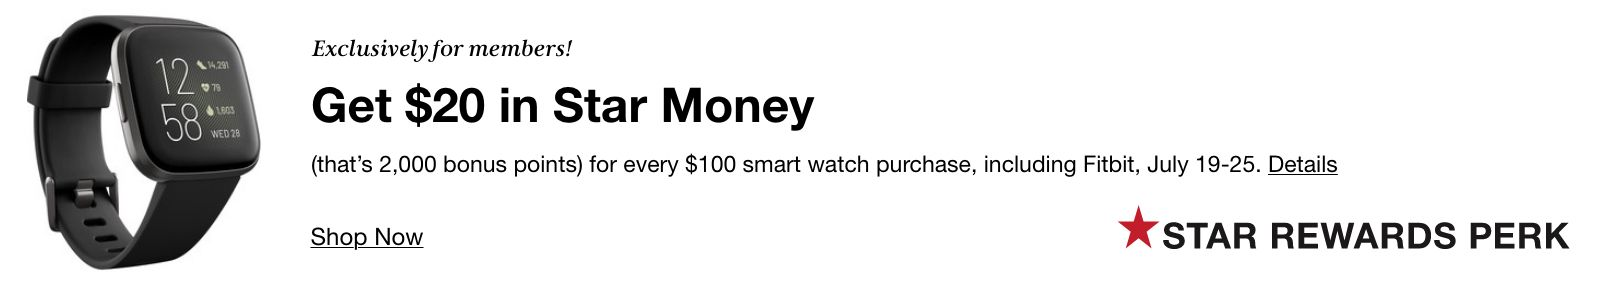 Star money promotion